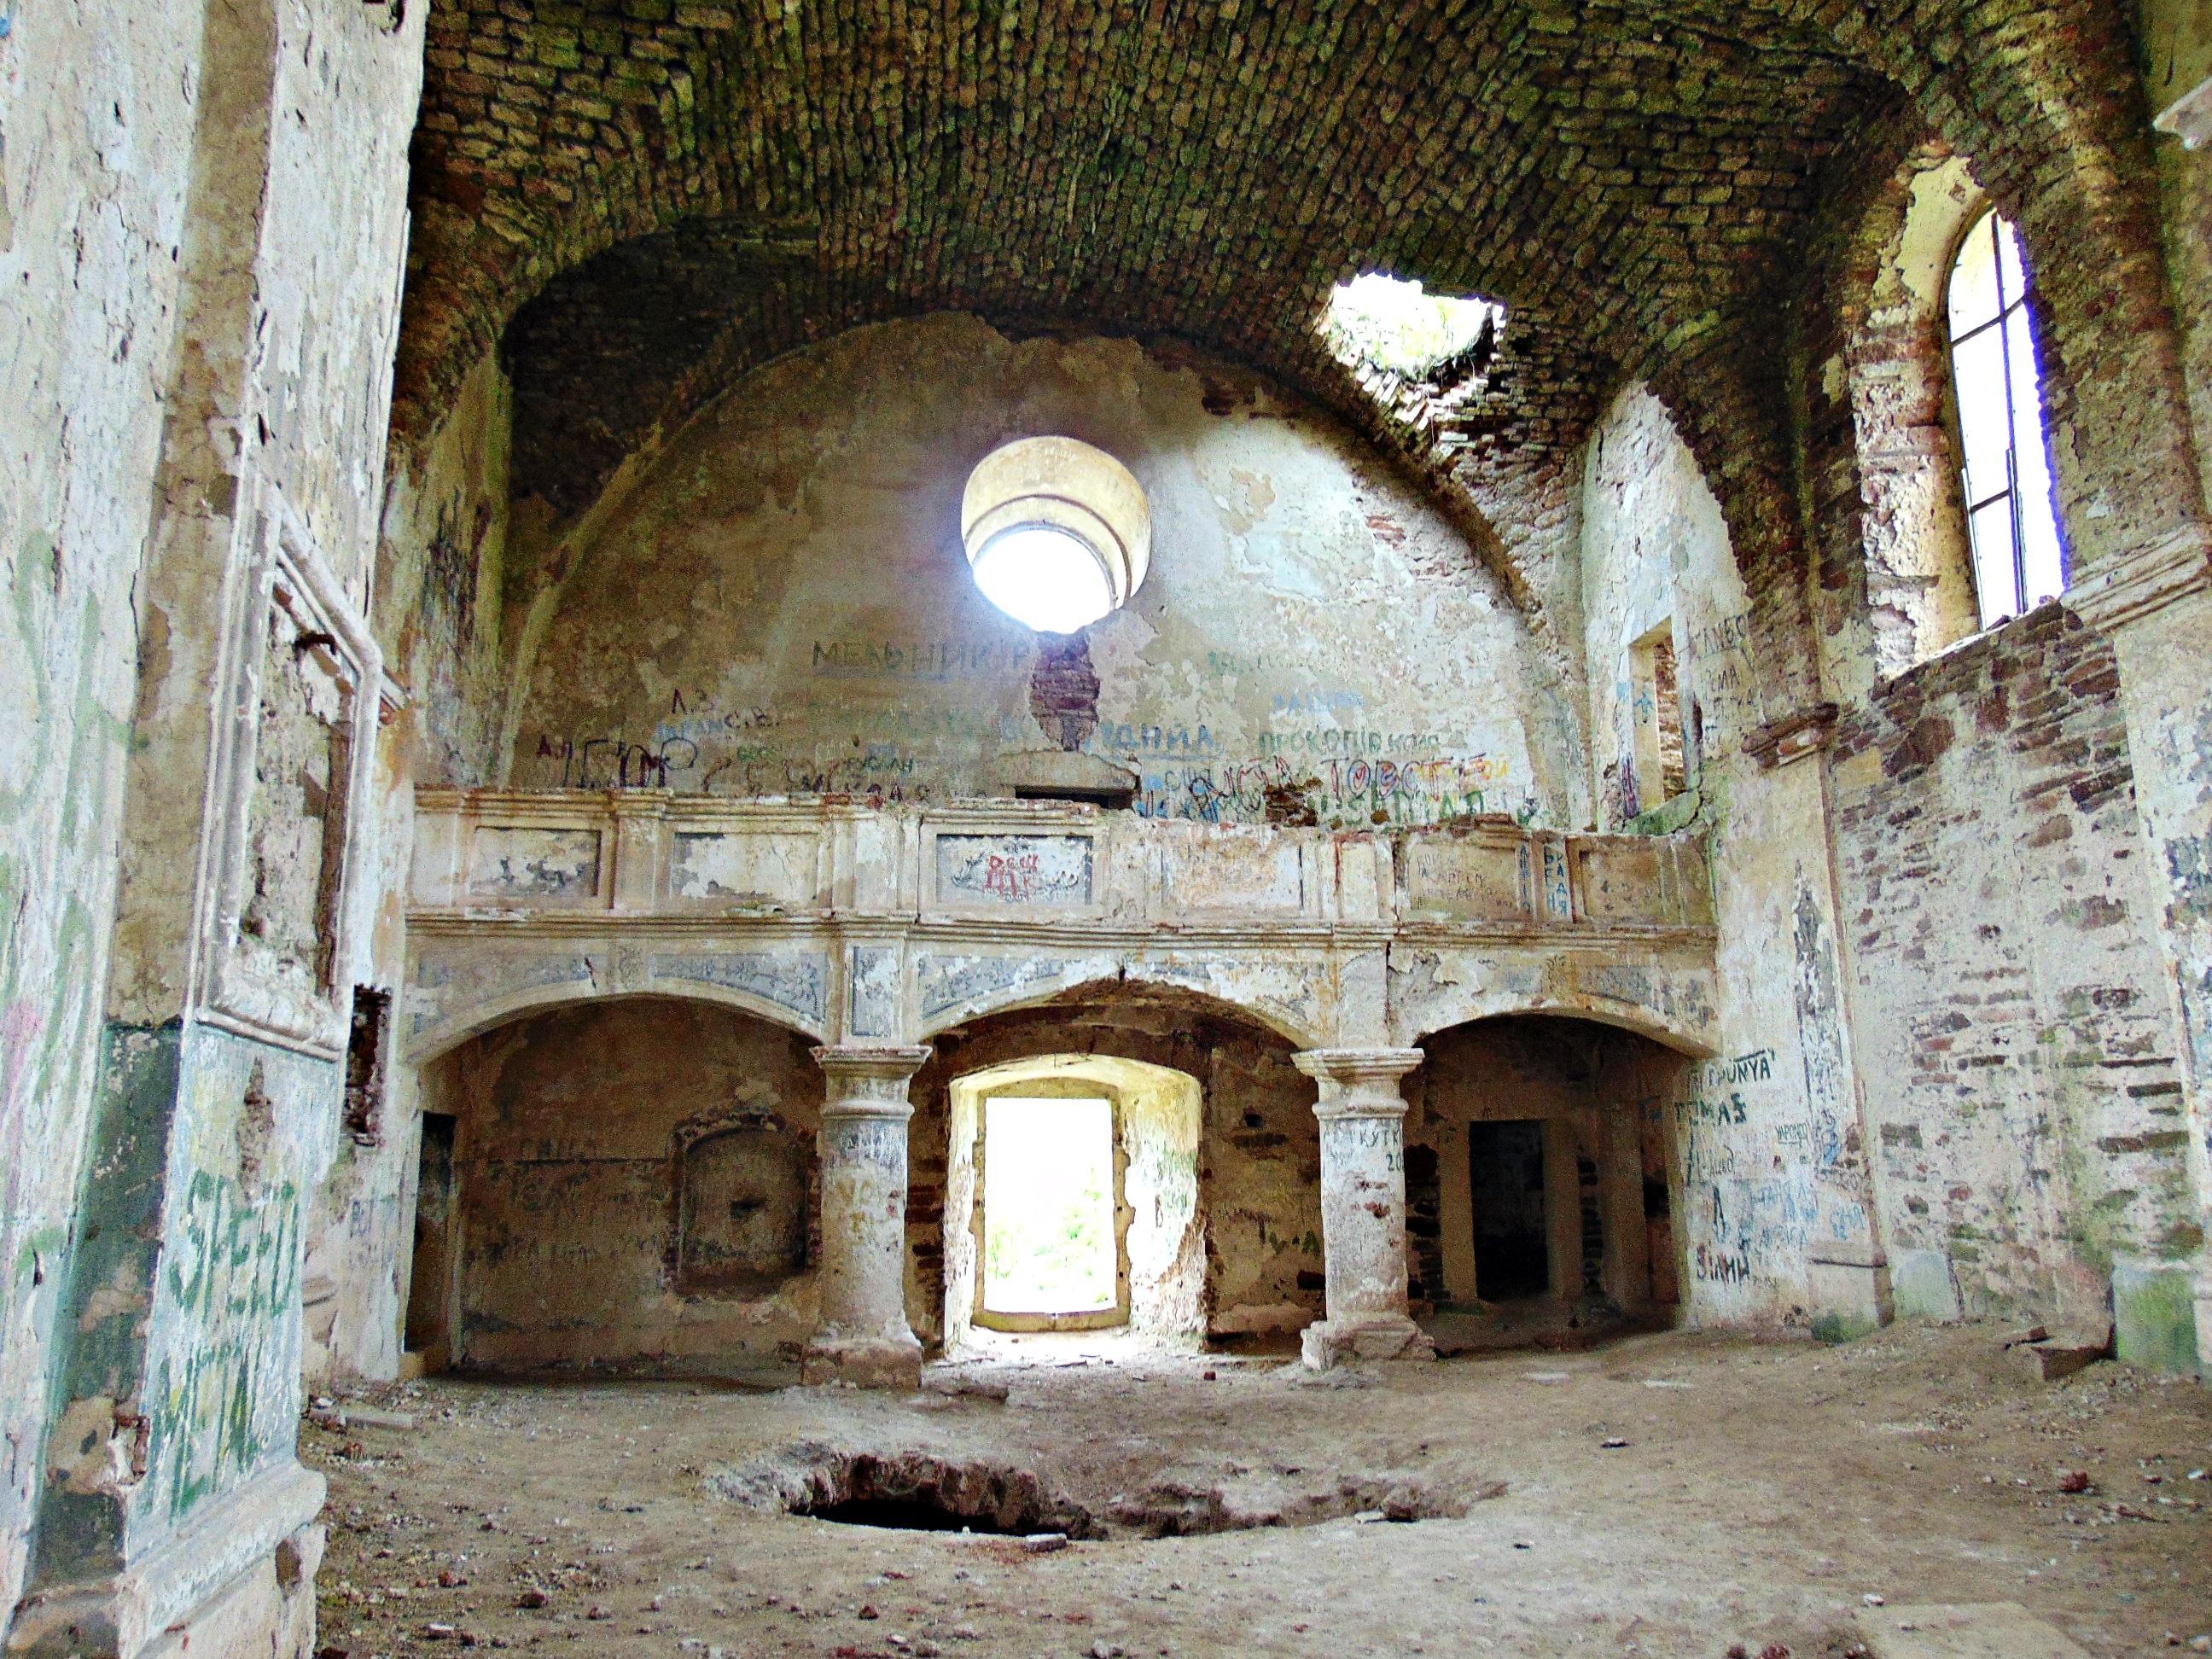 Monaster w Bakocie